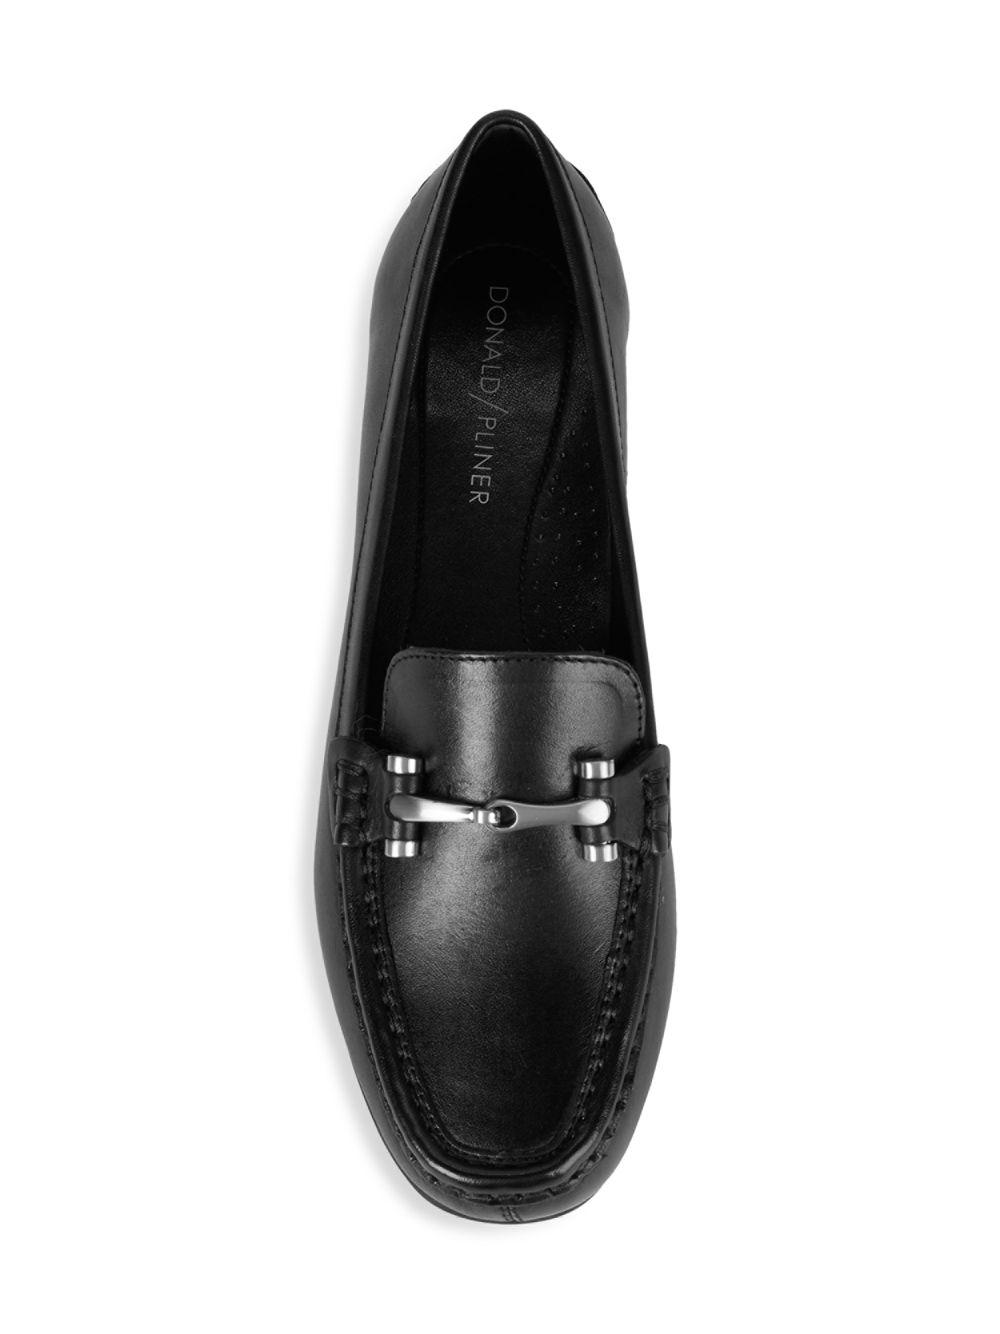 814418ab3a3 Donald J Pliner - Black Filo-43 Leather Driving Shoes - Lyst. View  fullscreen